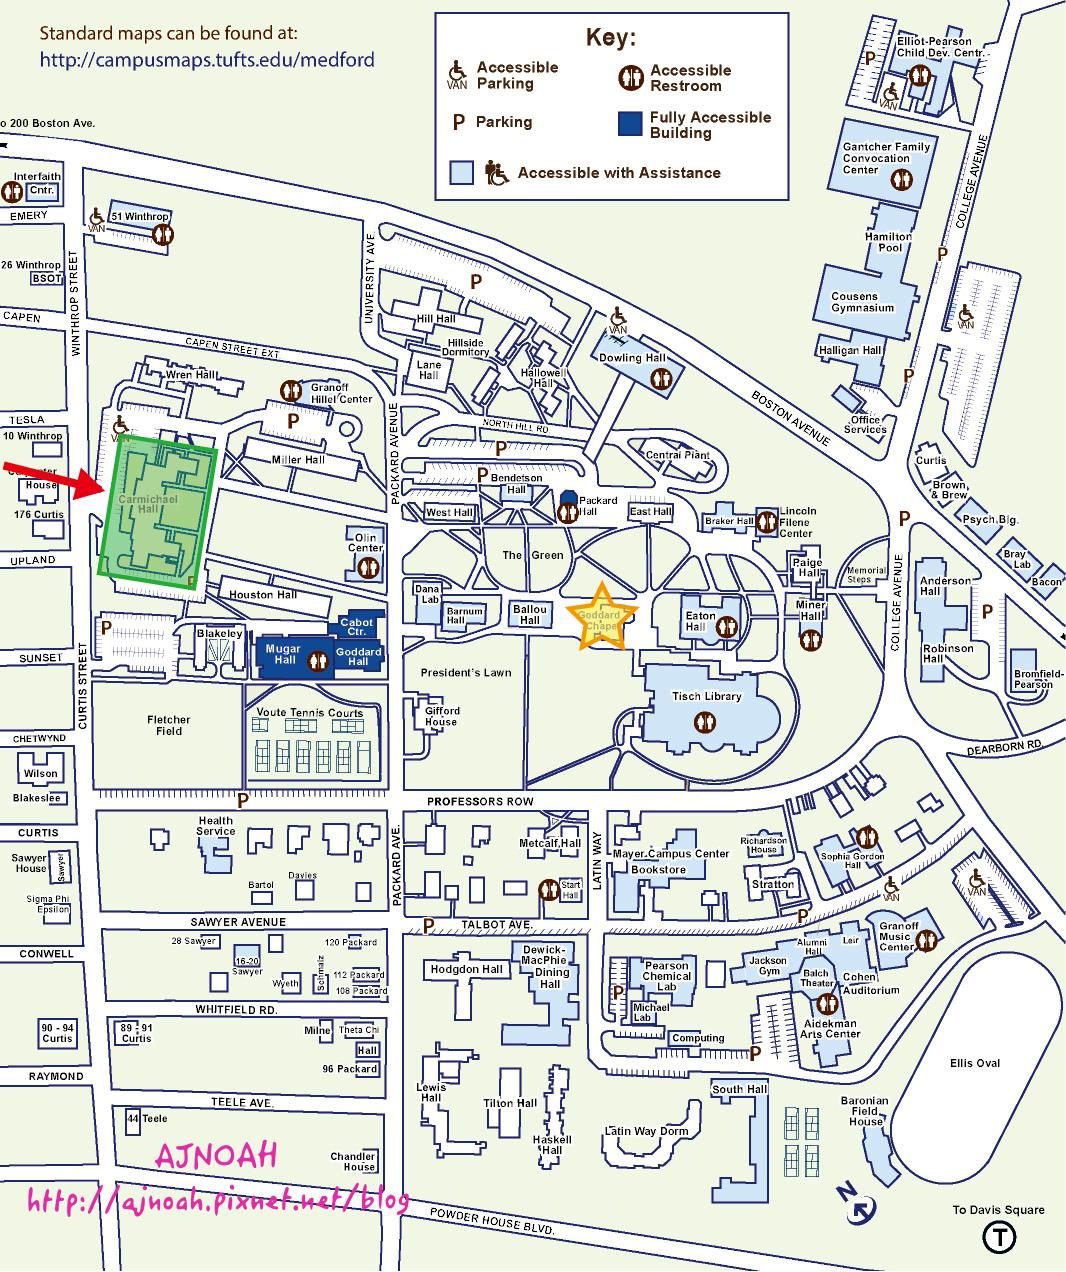 Tufts University map